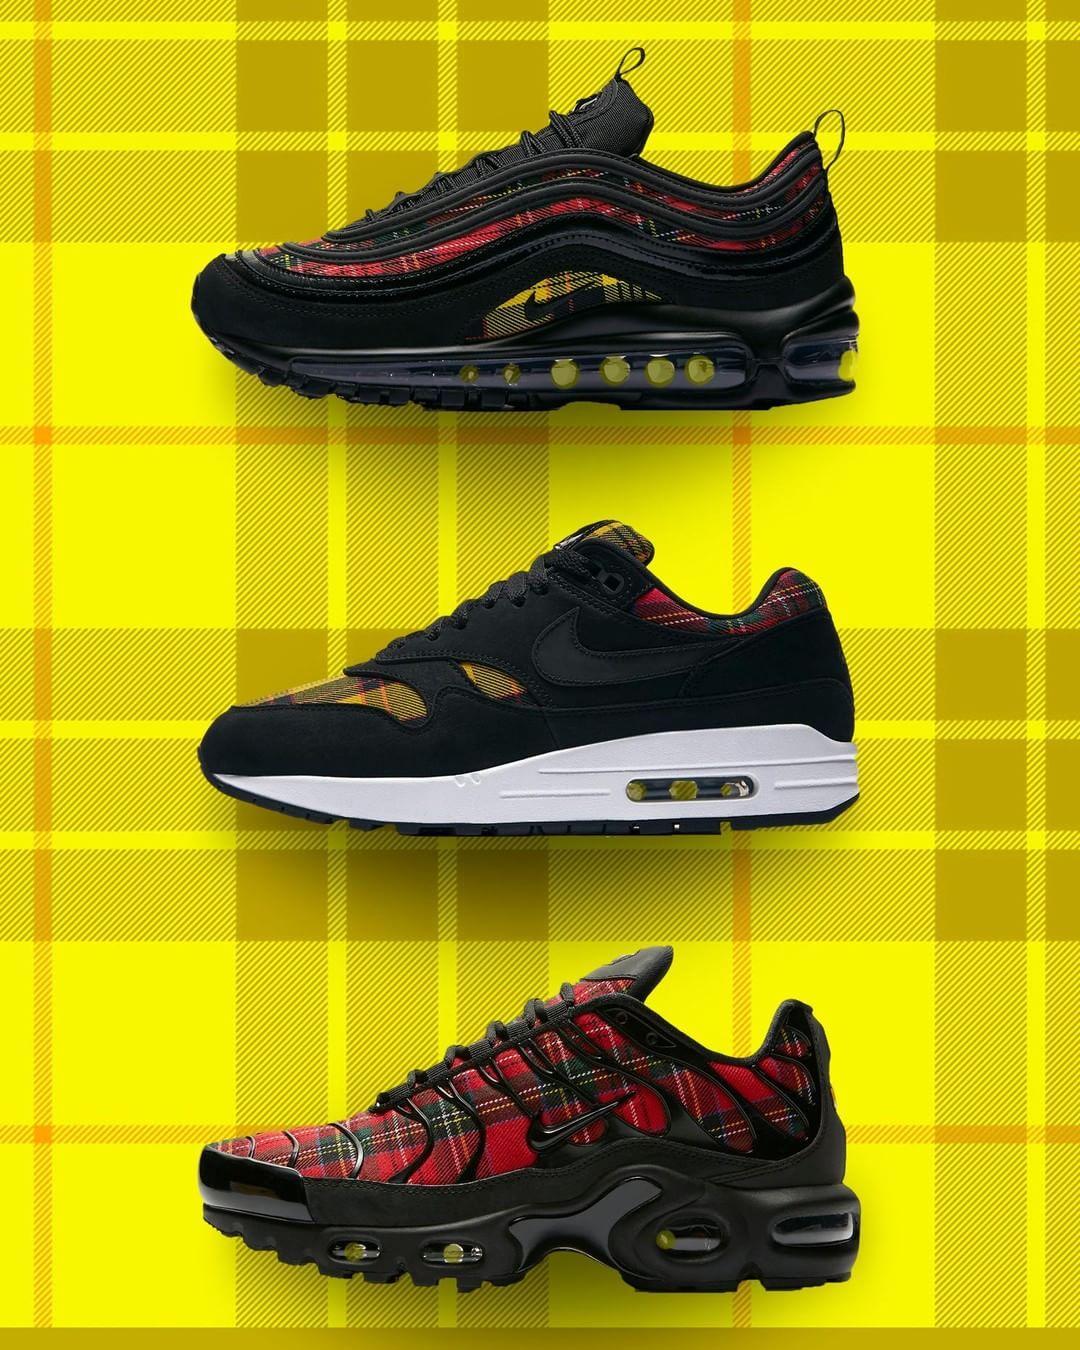 Zapatillas Nike Air Max 97 Tartan Pack Negro Nuevo 2019